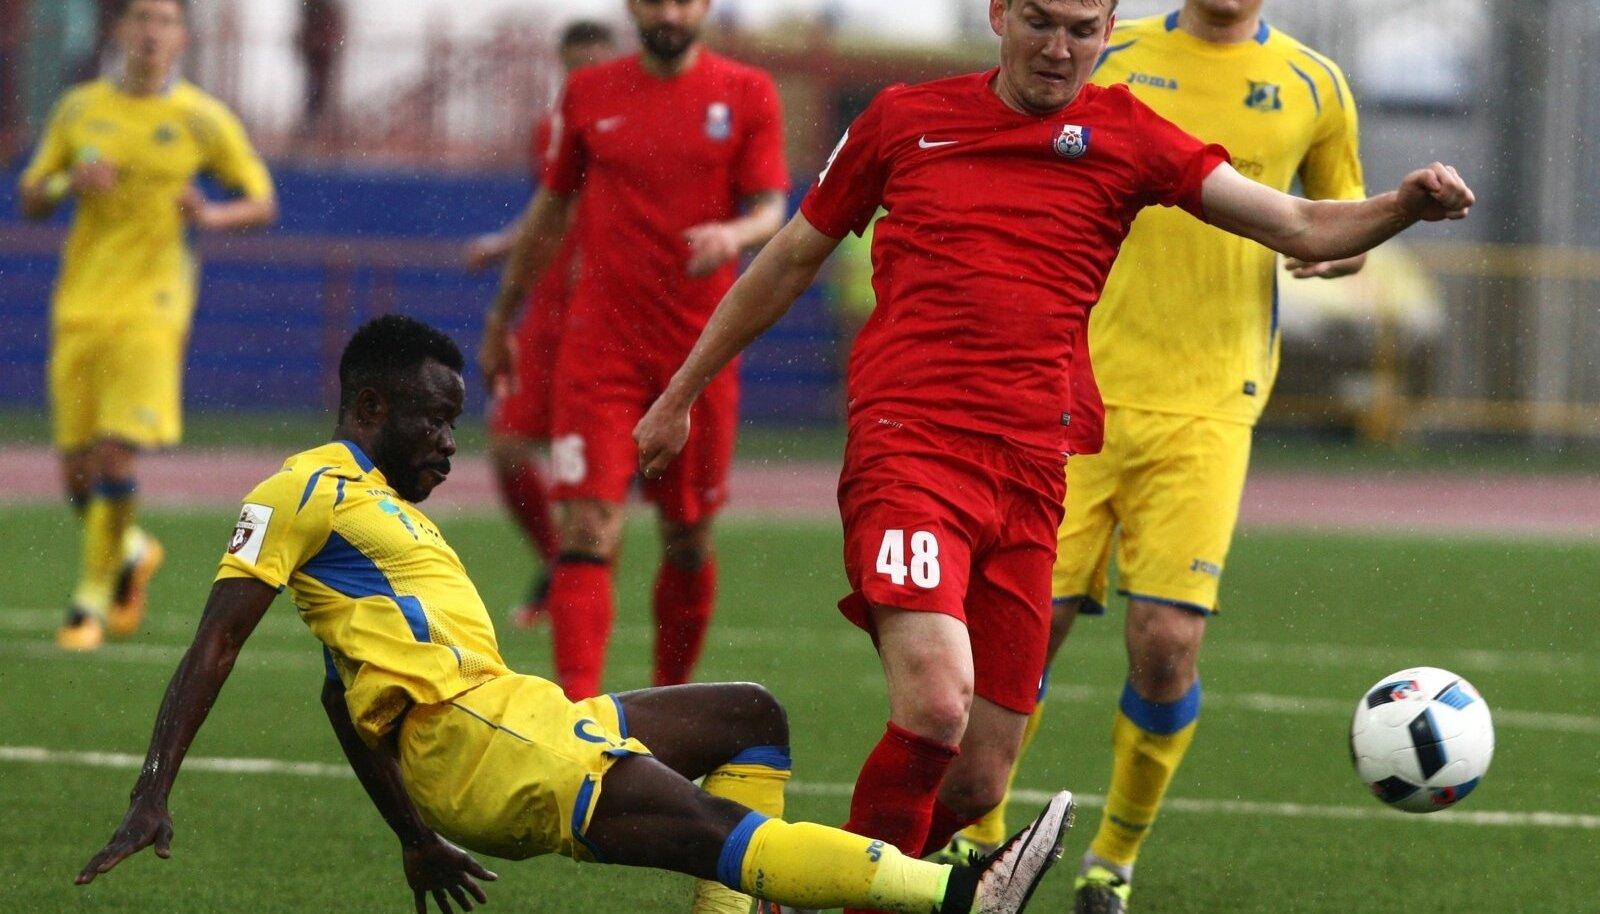 Football. Russian Premier League. Mordovia vs. Rostov